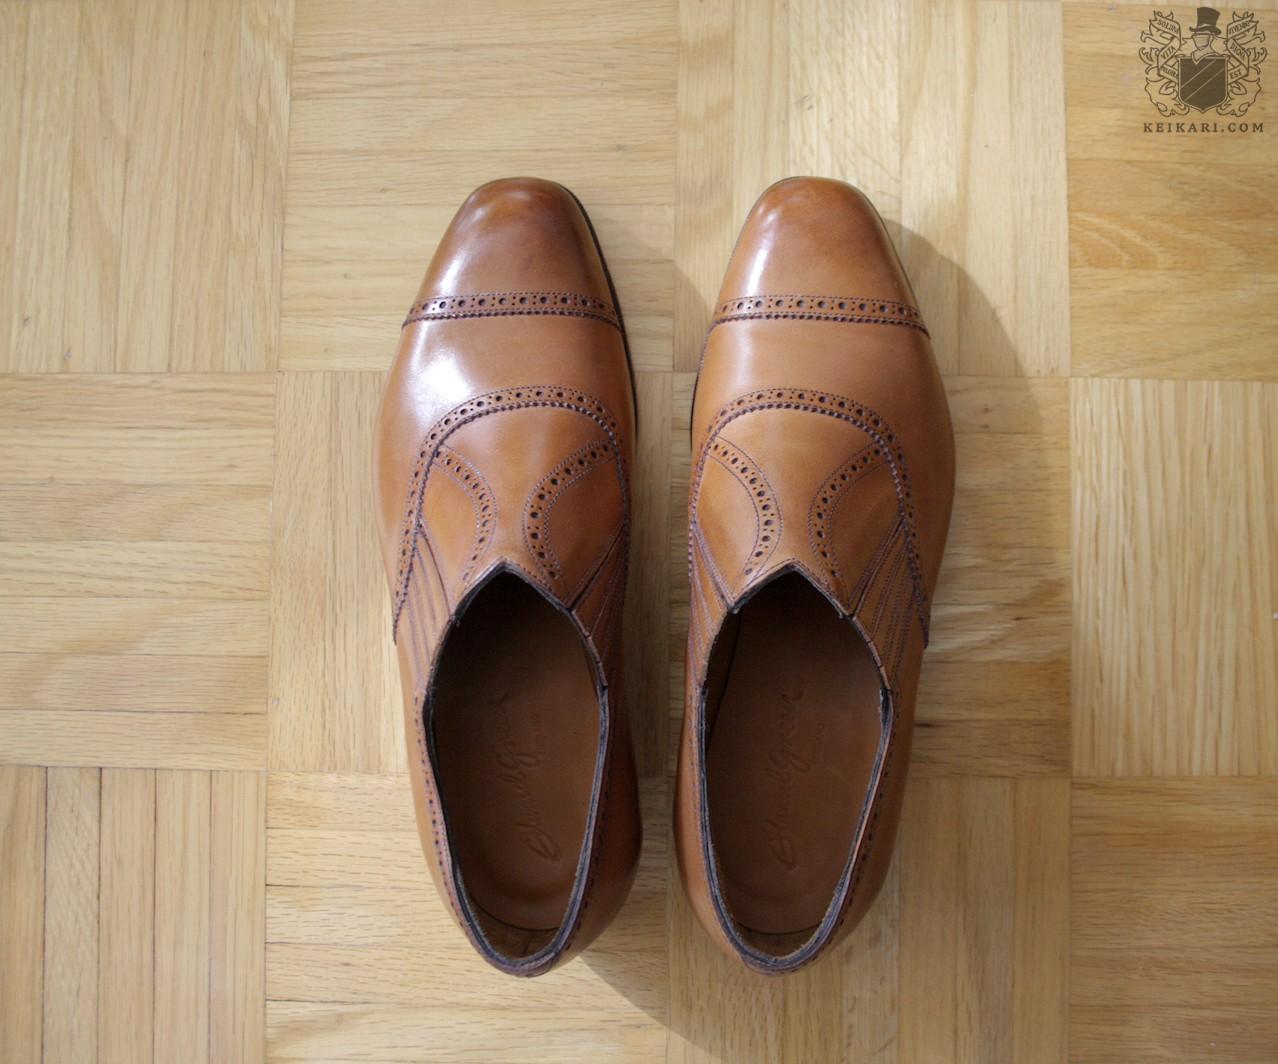 edward_green_kibworth_side_elastic_shoes_at_keikari_dot_com12